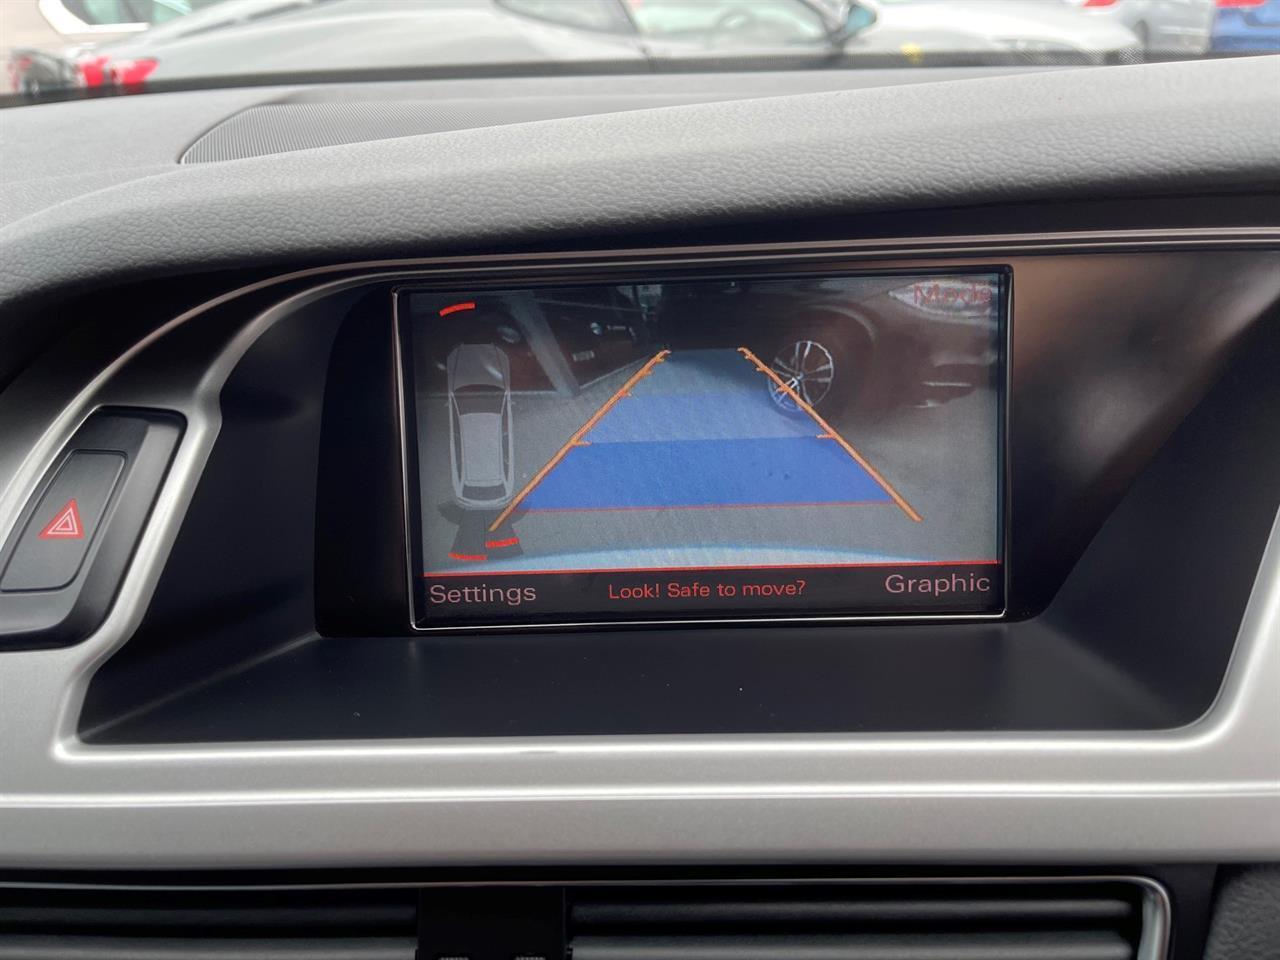 image-12, 2009 Audi S4 3.0 V6 Supercharged TFSI Quattro Wago at Christchurch